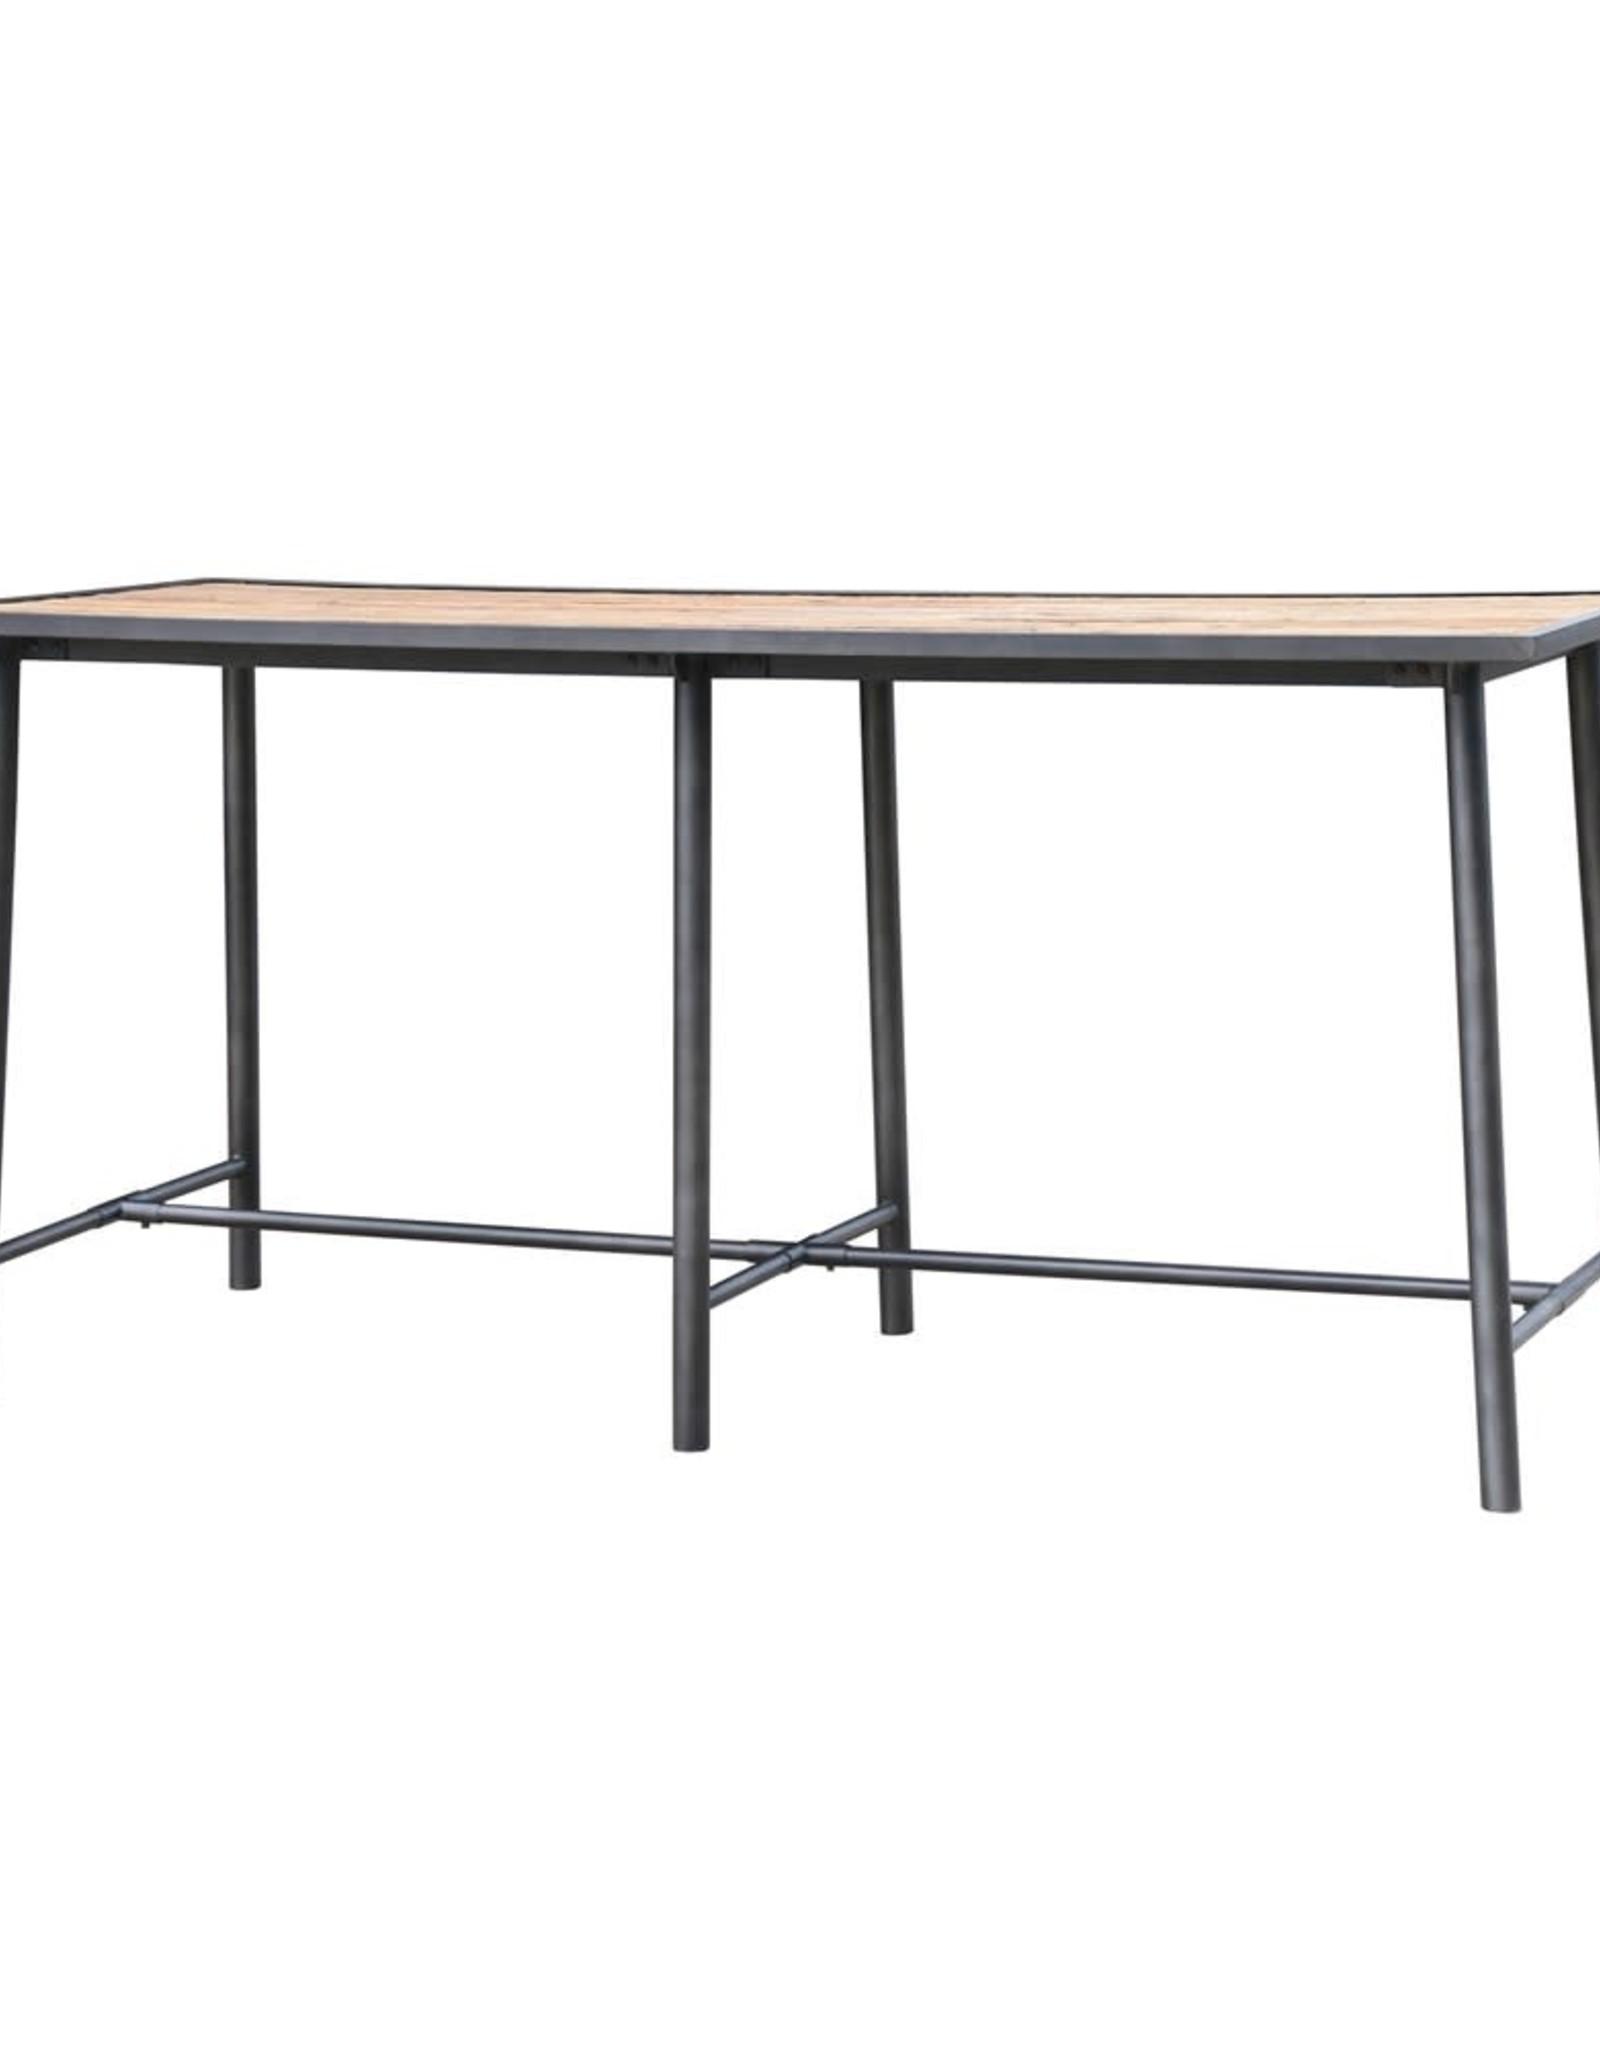 TABLE BAR DUKE WASHED OLD OAK